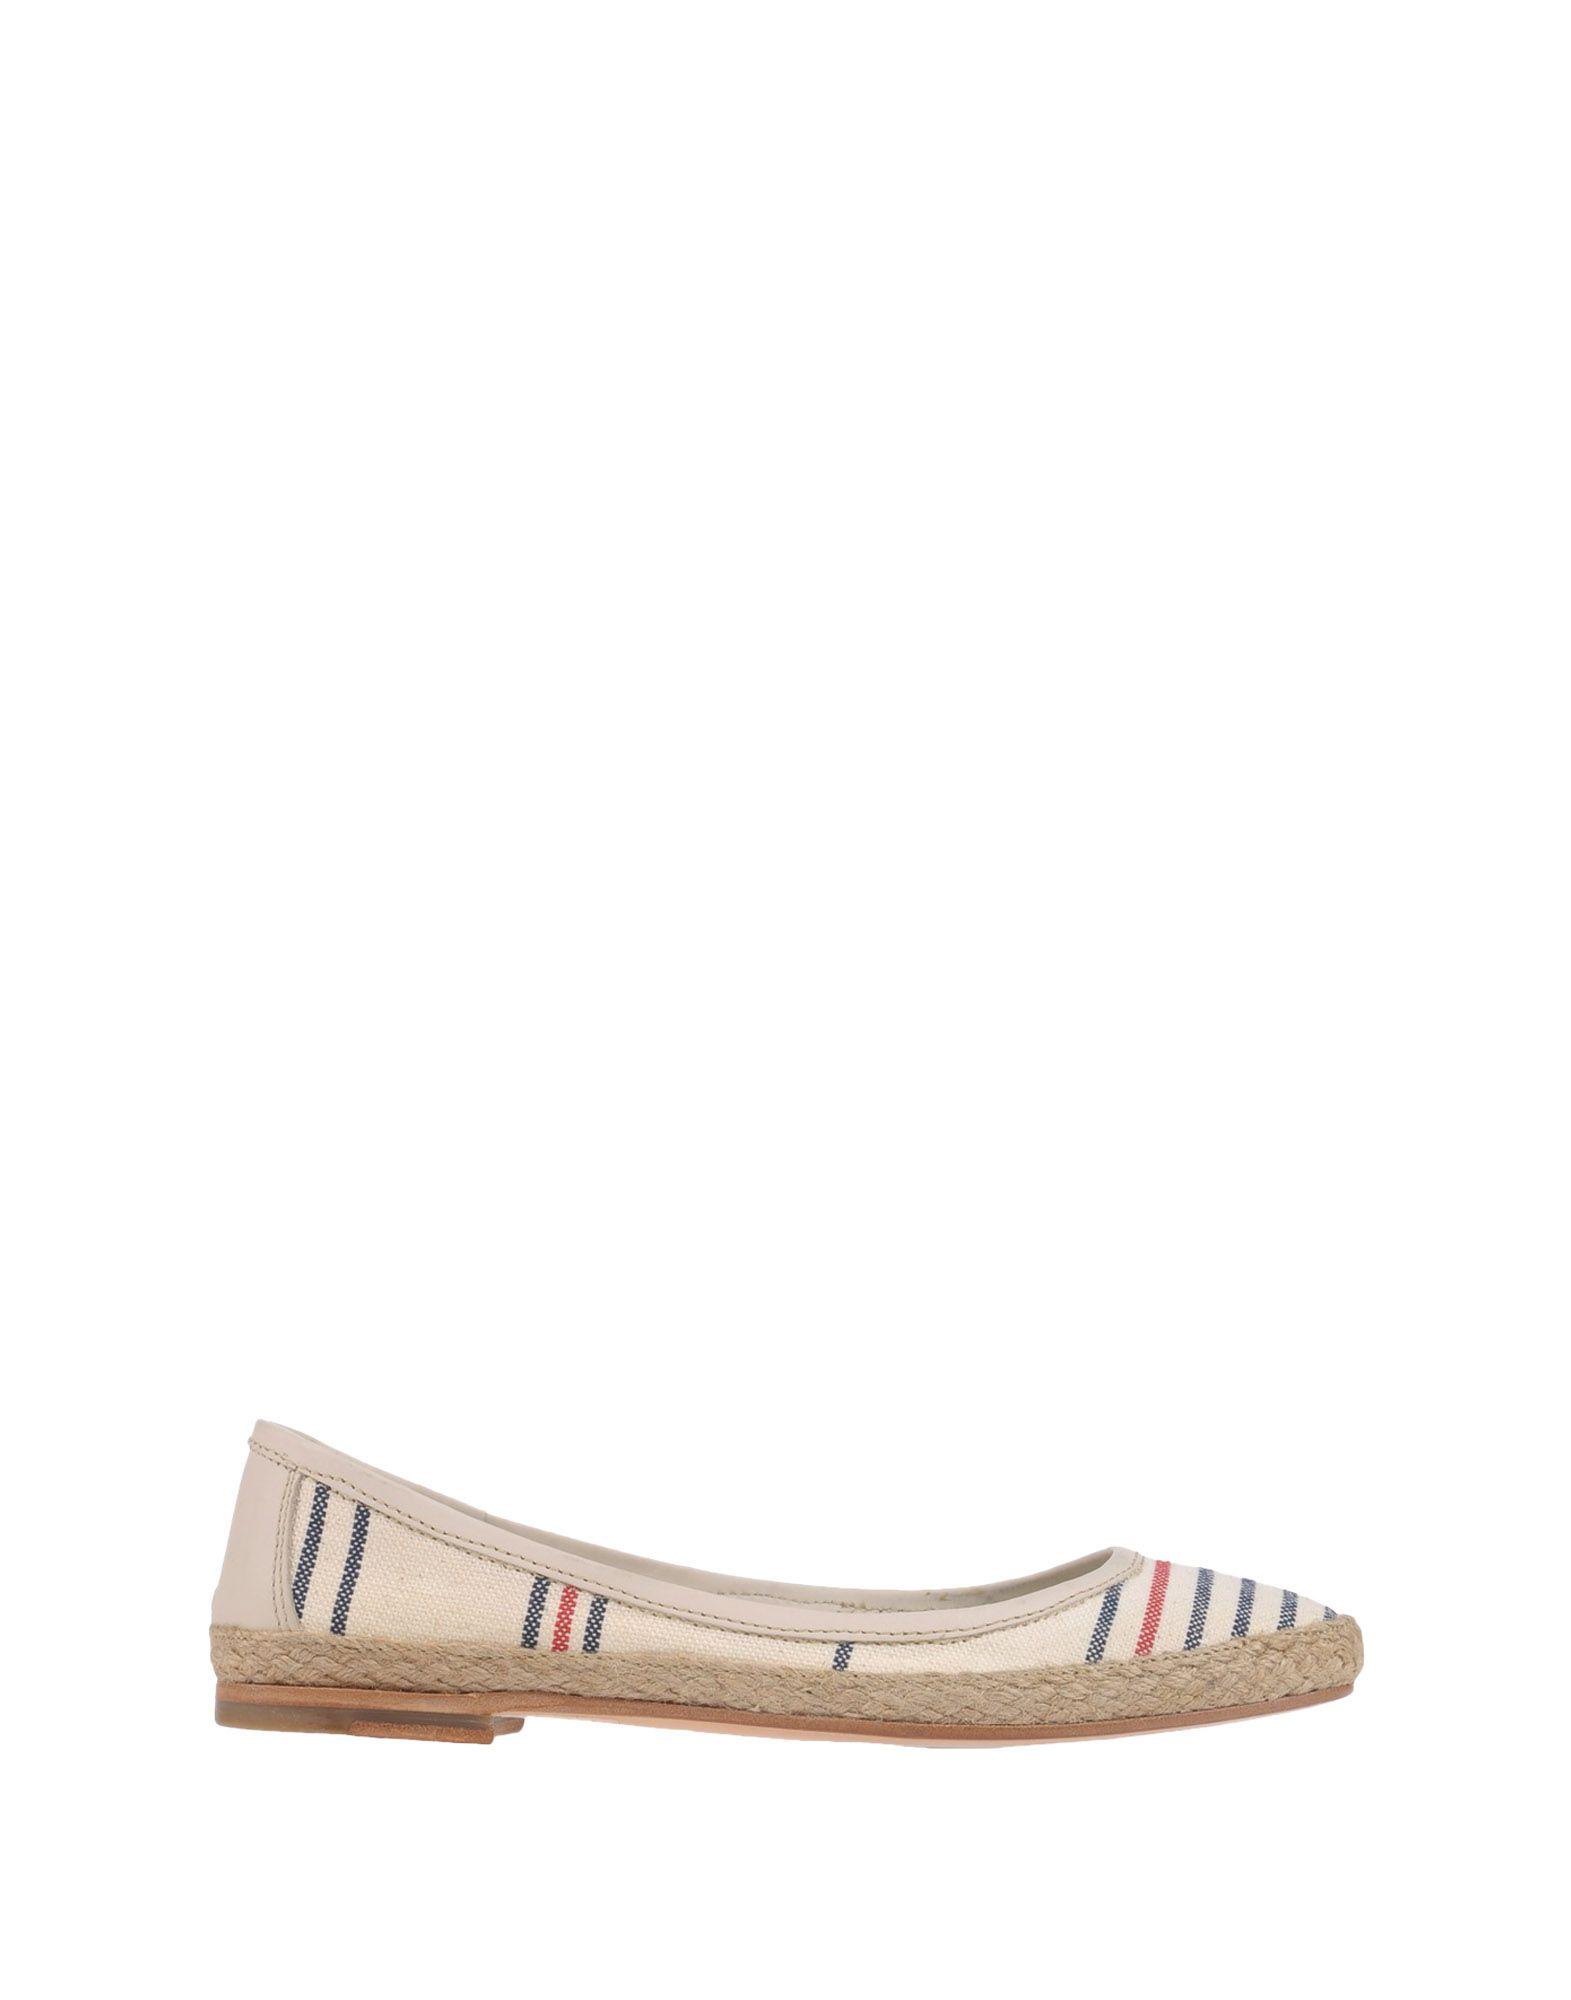 N.D.C. Made By Hand Espadrilles Espadrilles Espadrilles Damen  11195729NL Heiße Schuhe 7f8c17